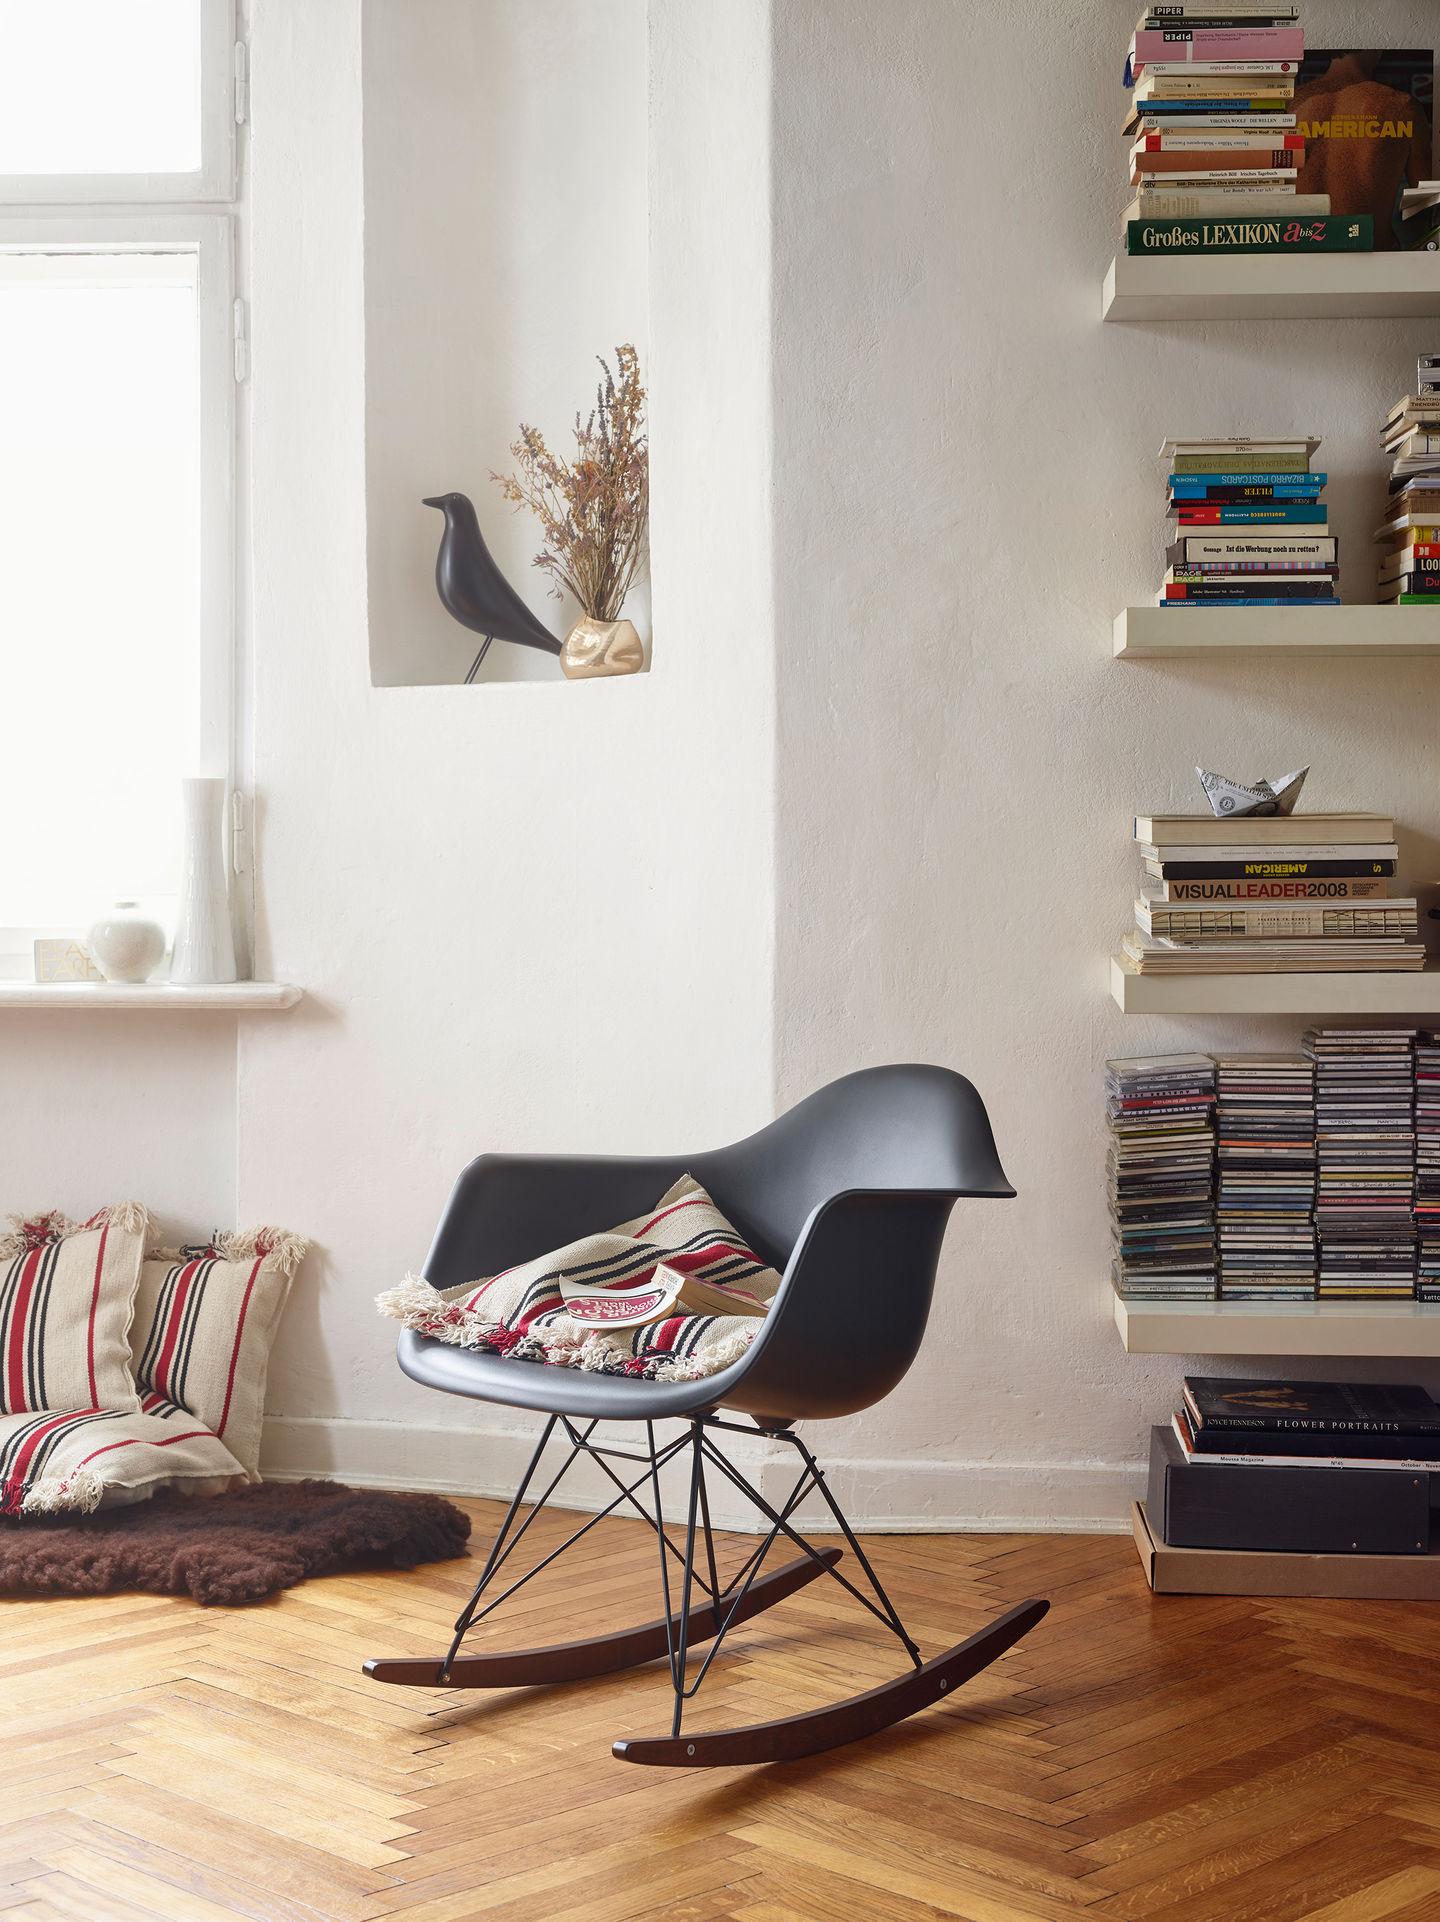 Sedia Dondolo Vitra Eames.Vitra Eames Plastic Armchair Rar